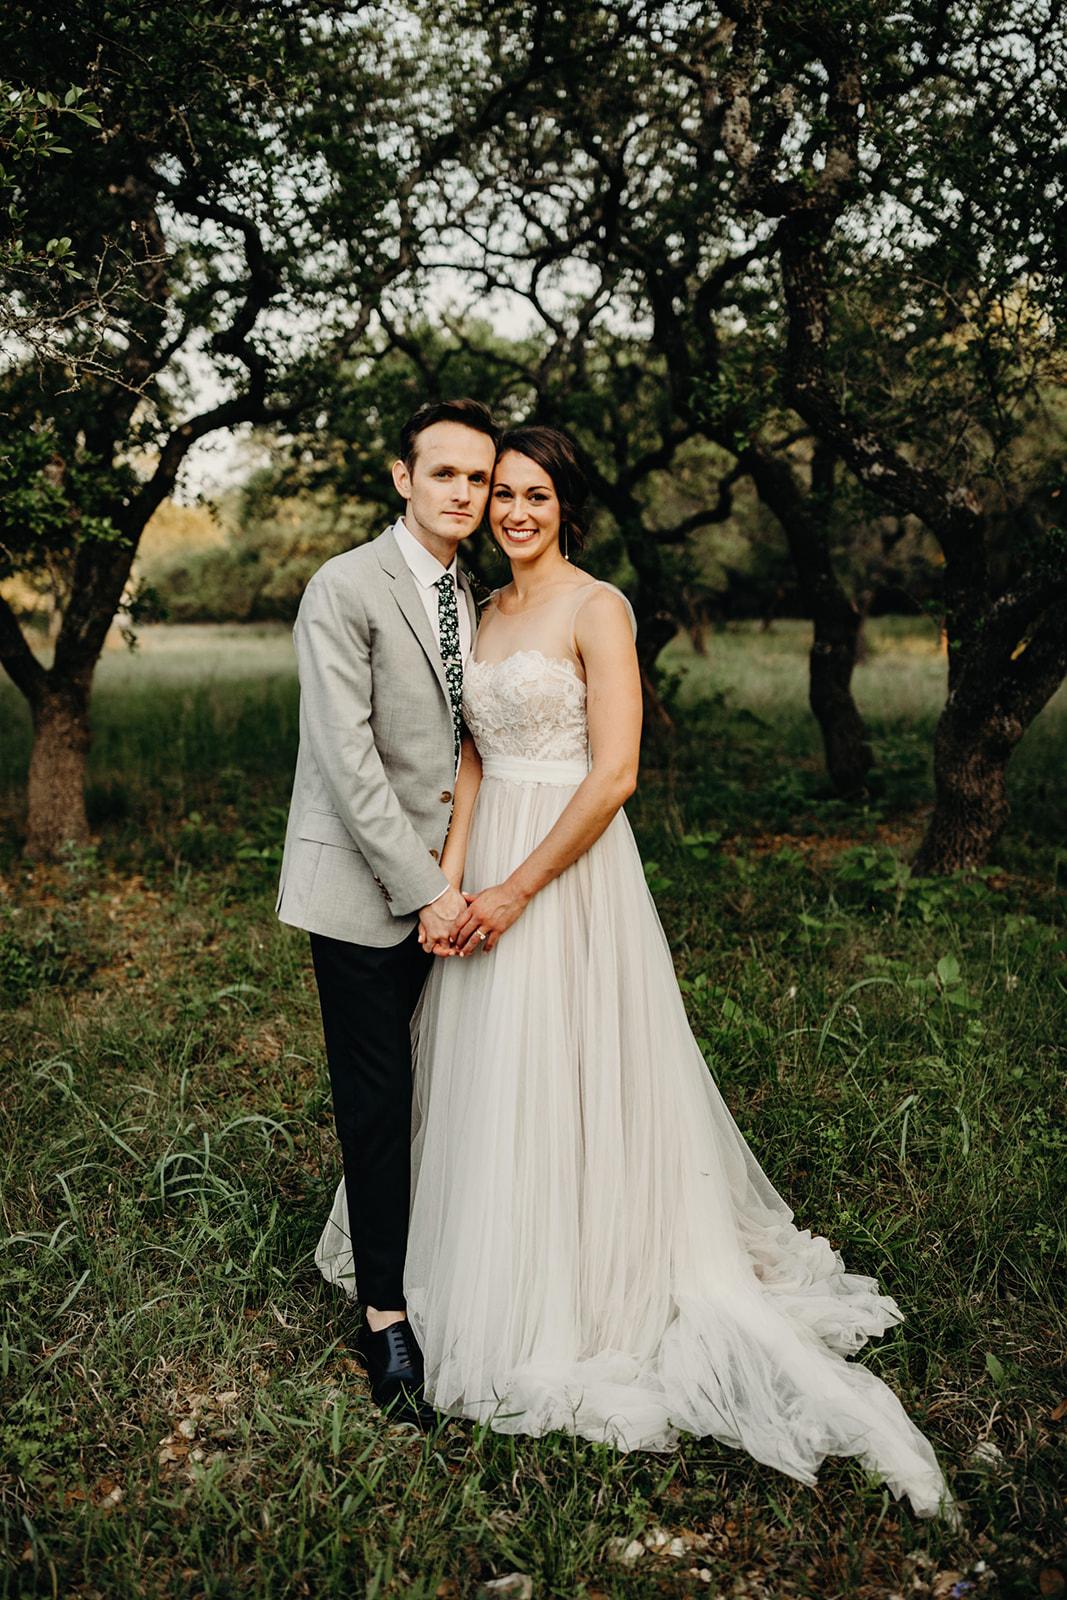 austin-wedding-lindsey-bryce-532.jpg